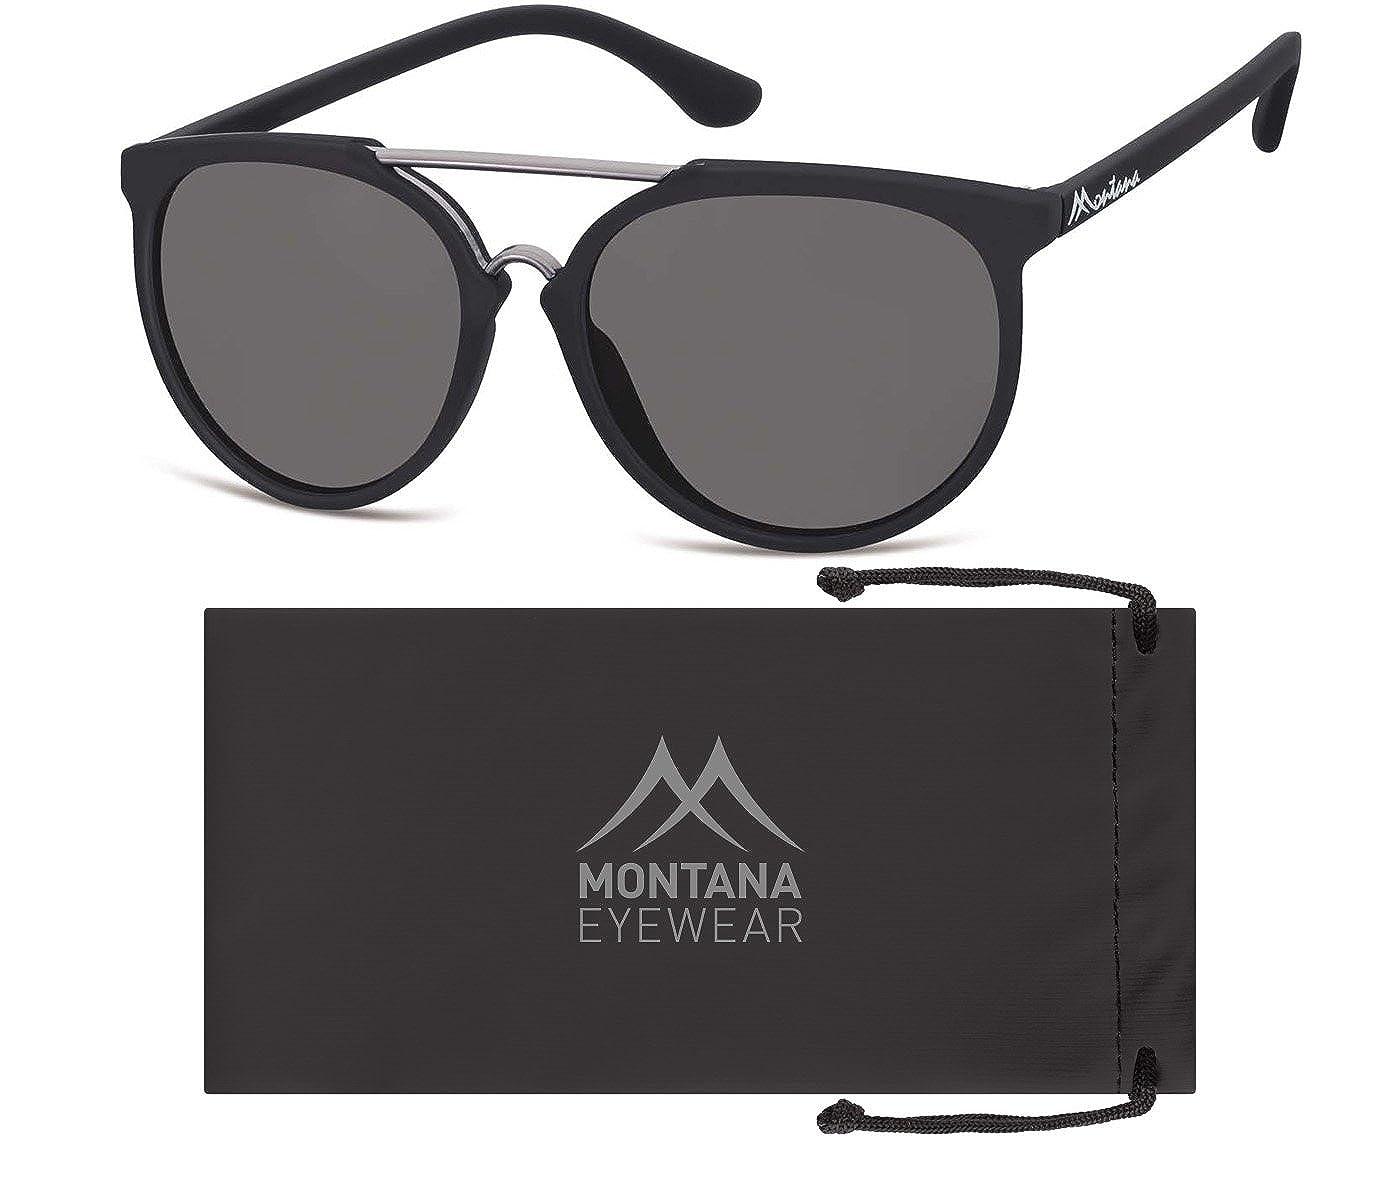 TALLA Talla única. Montana, Gafas de Sol Unisex Adulto